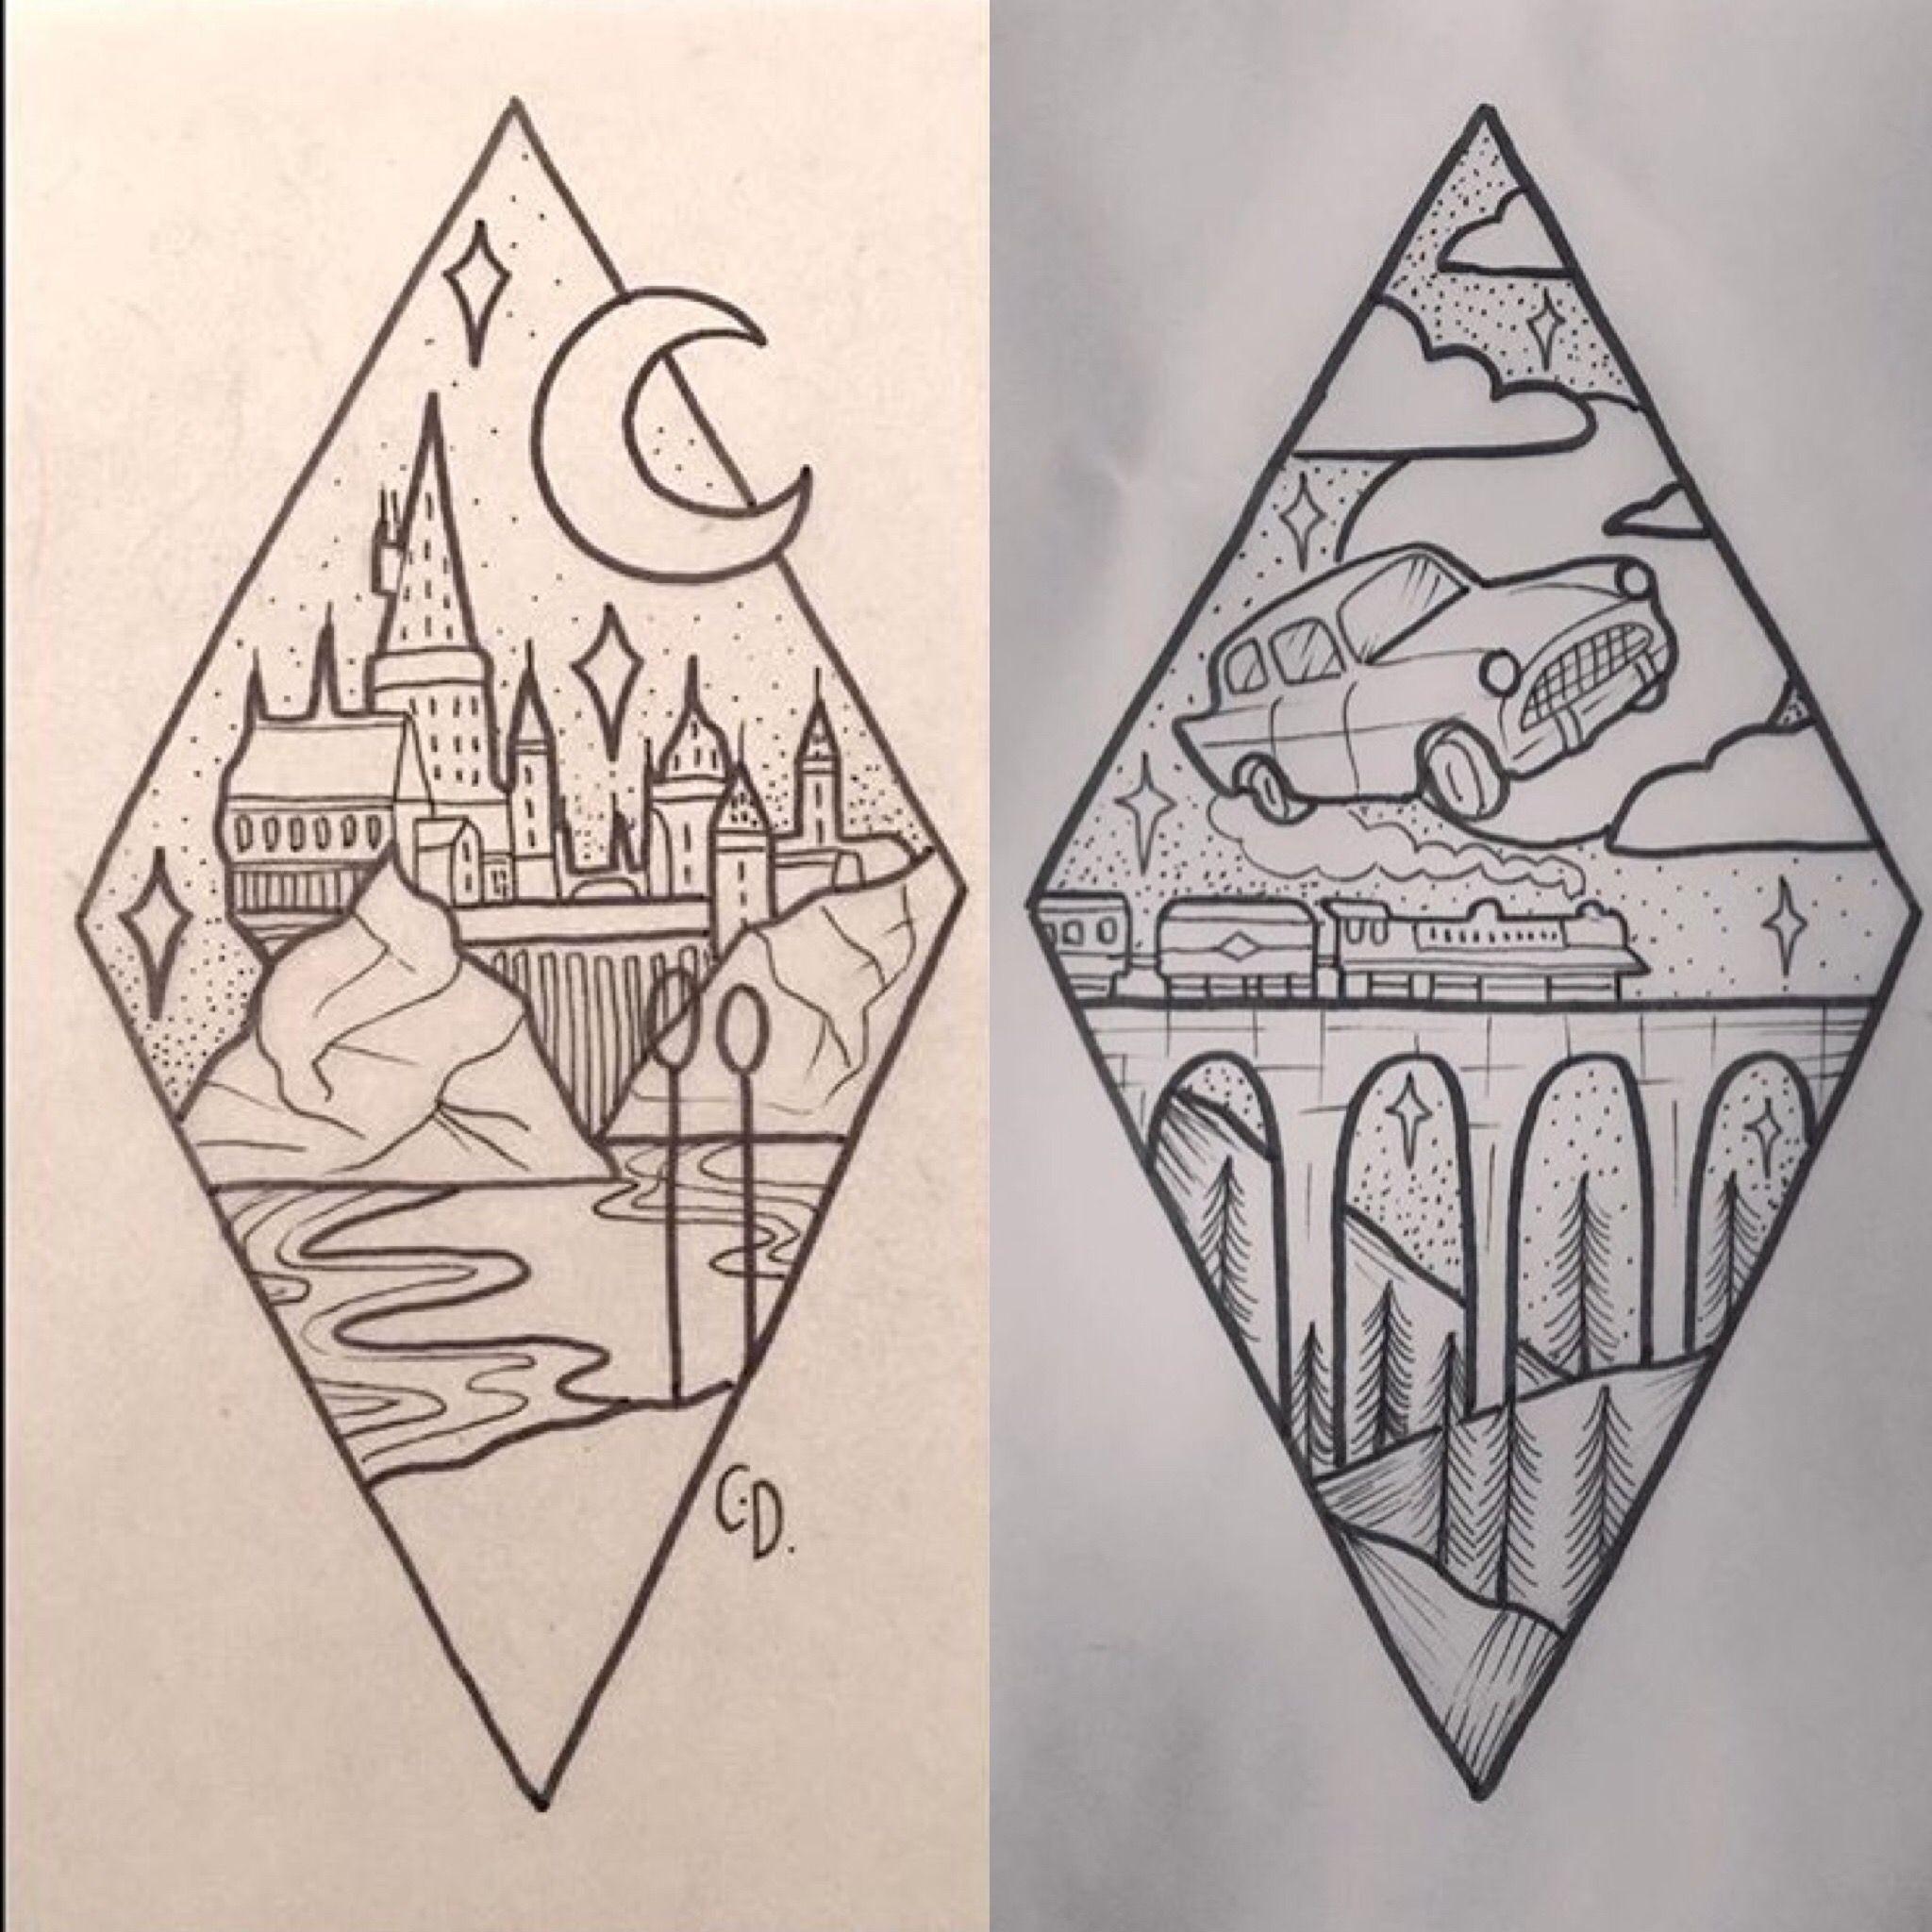 Harry Potter Ausmalbilder Wappen Inspirierend Harry Potter Tattoo Ideas Tattoo Design Pinterest Luxus Harry Potter Stock